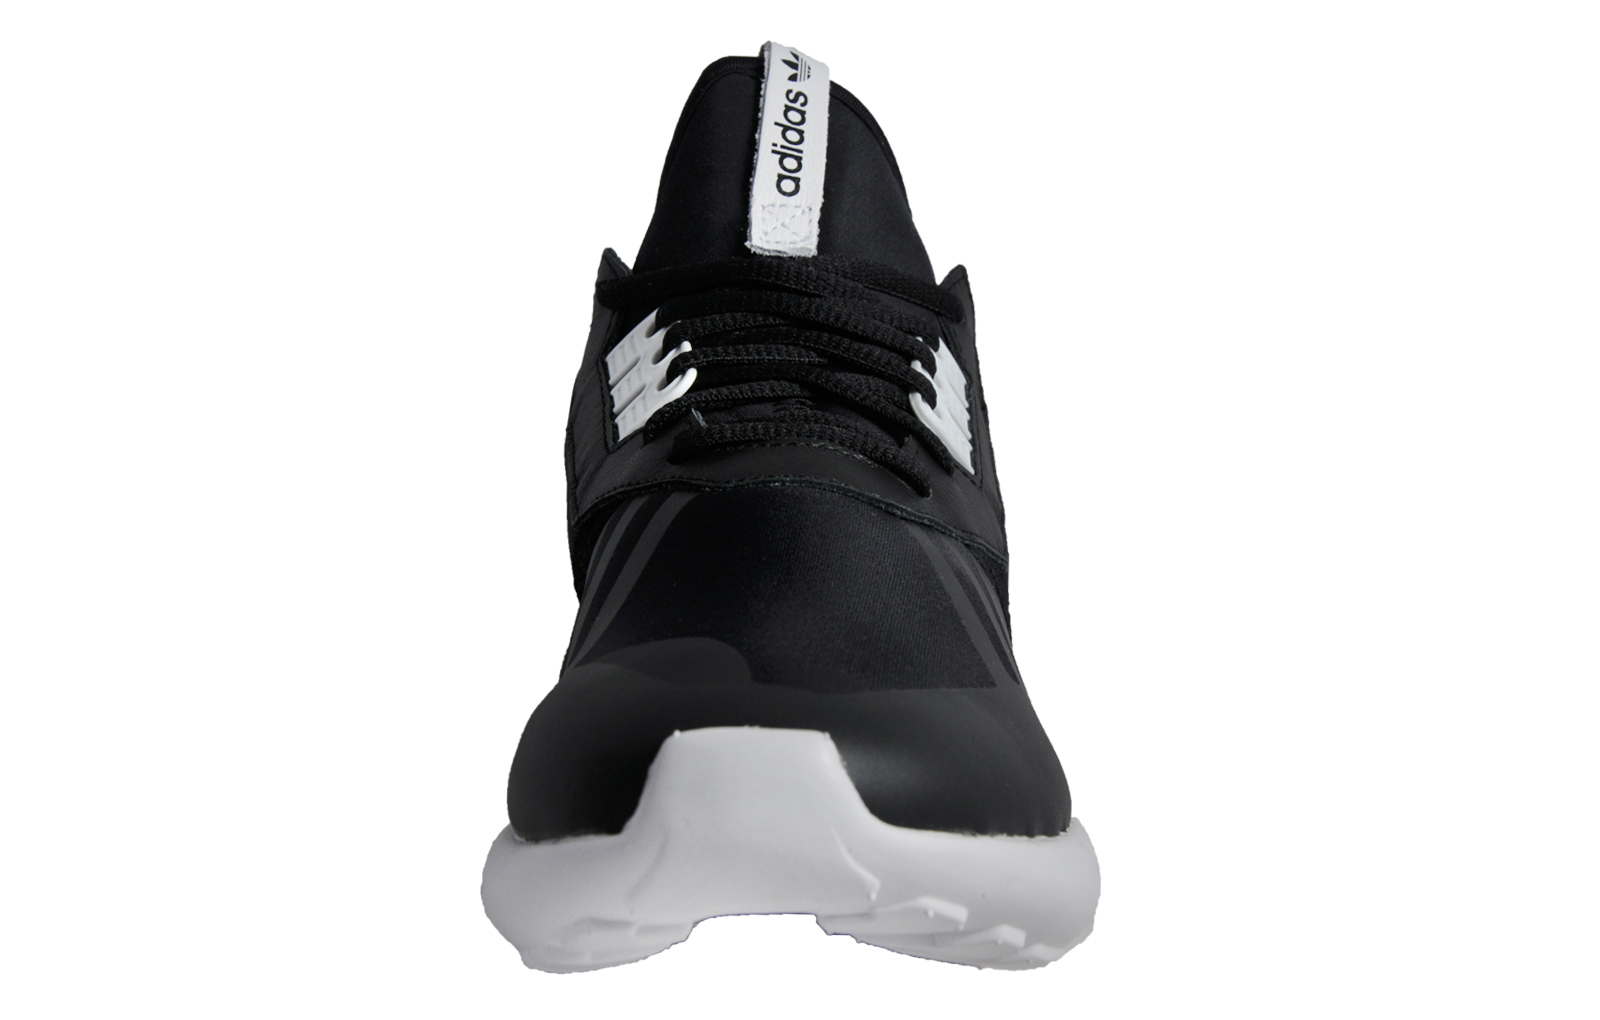 8fd4b00f5 Adidas Originals Tubular Runner Mens Classic Casual Retro Trainers ...